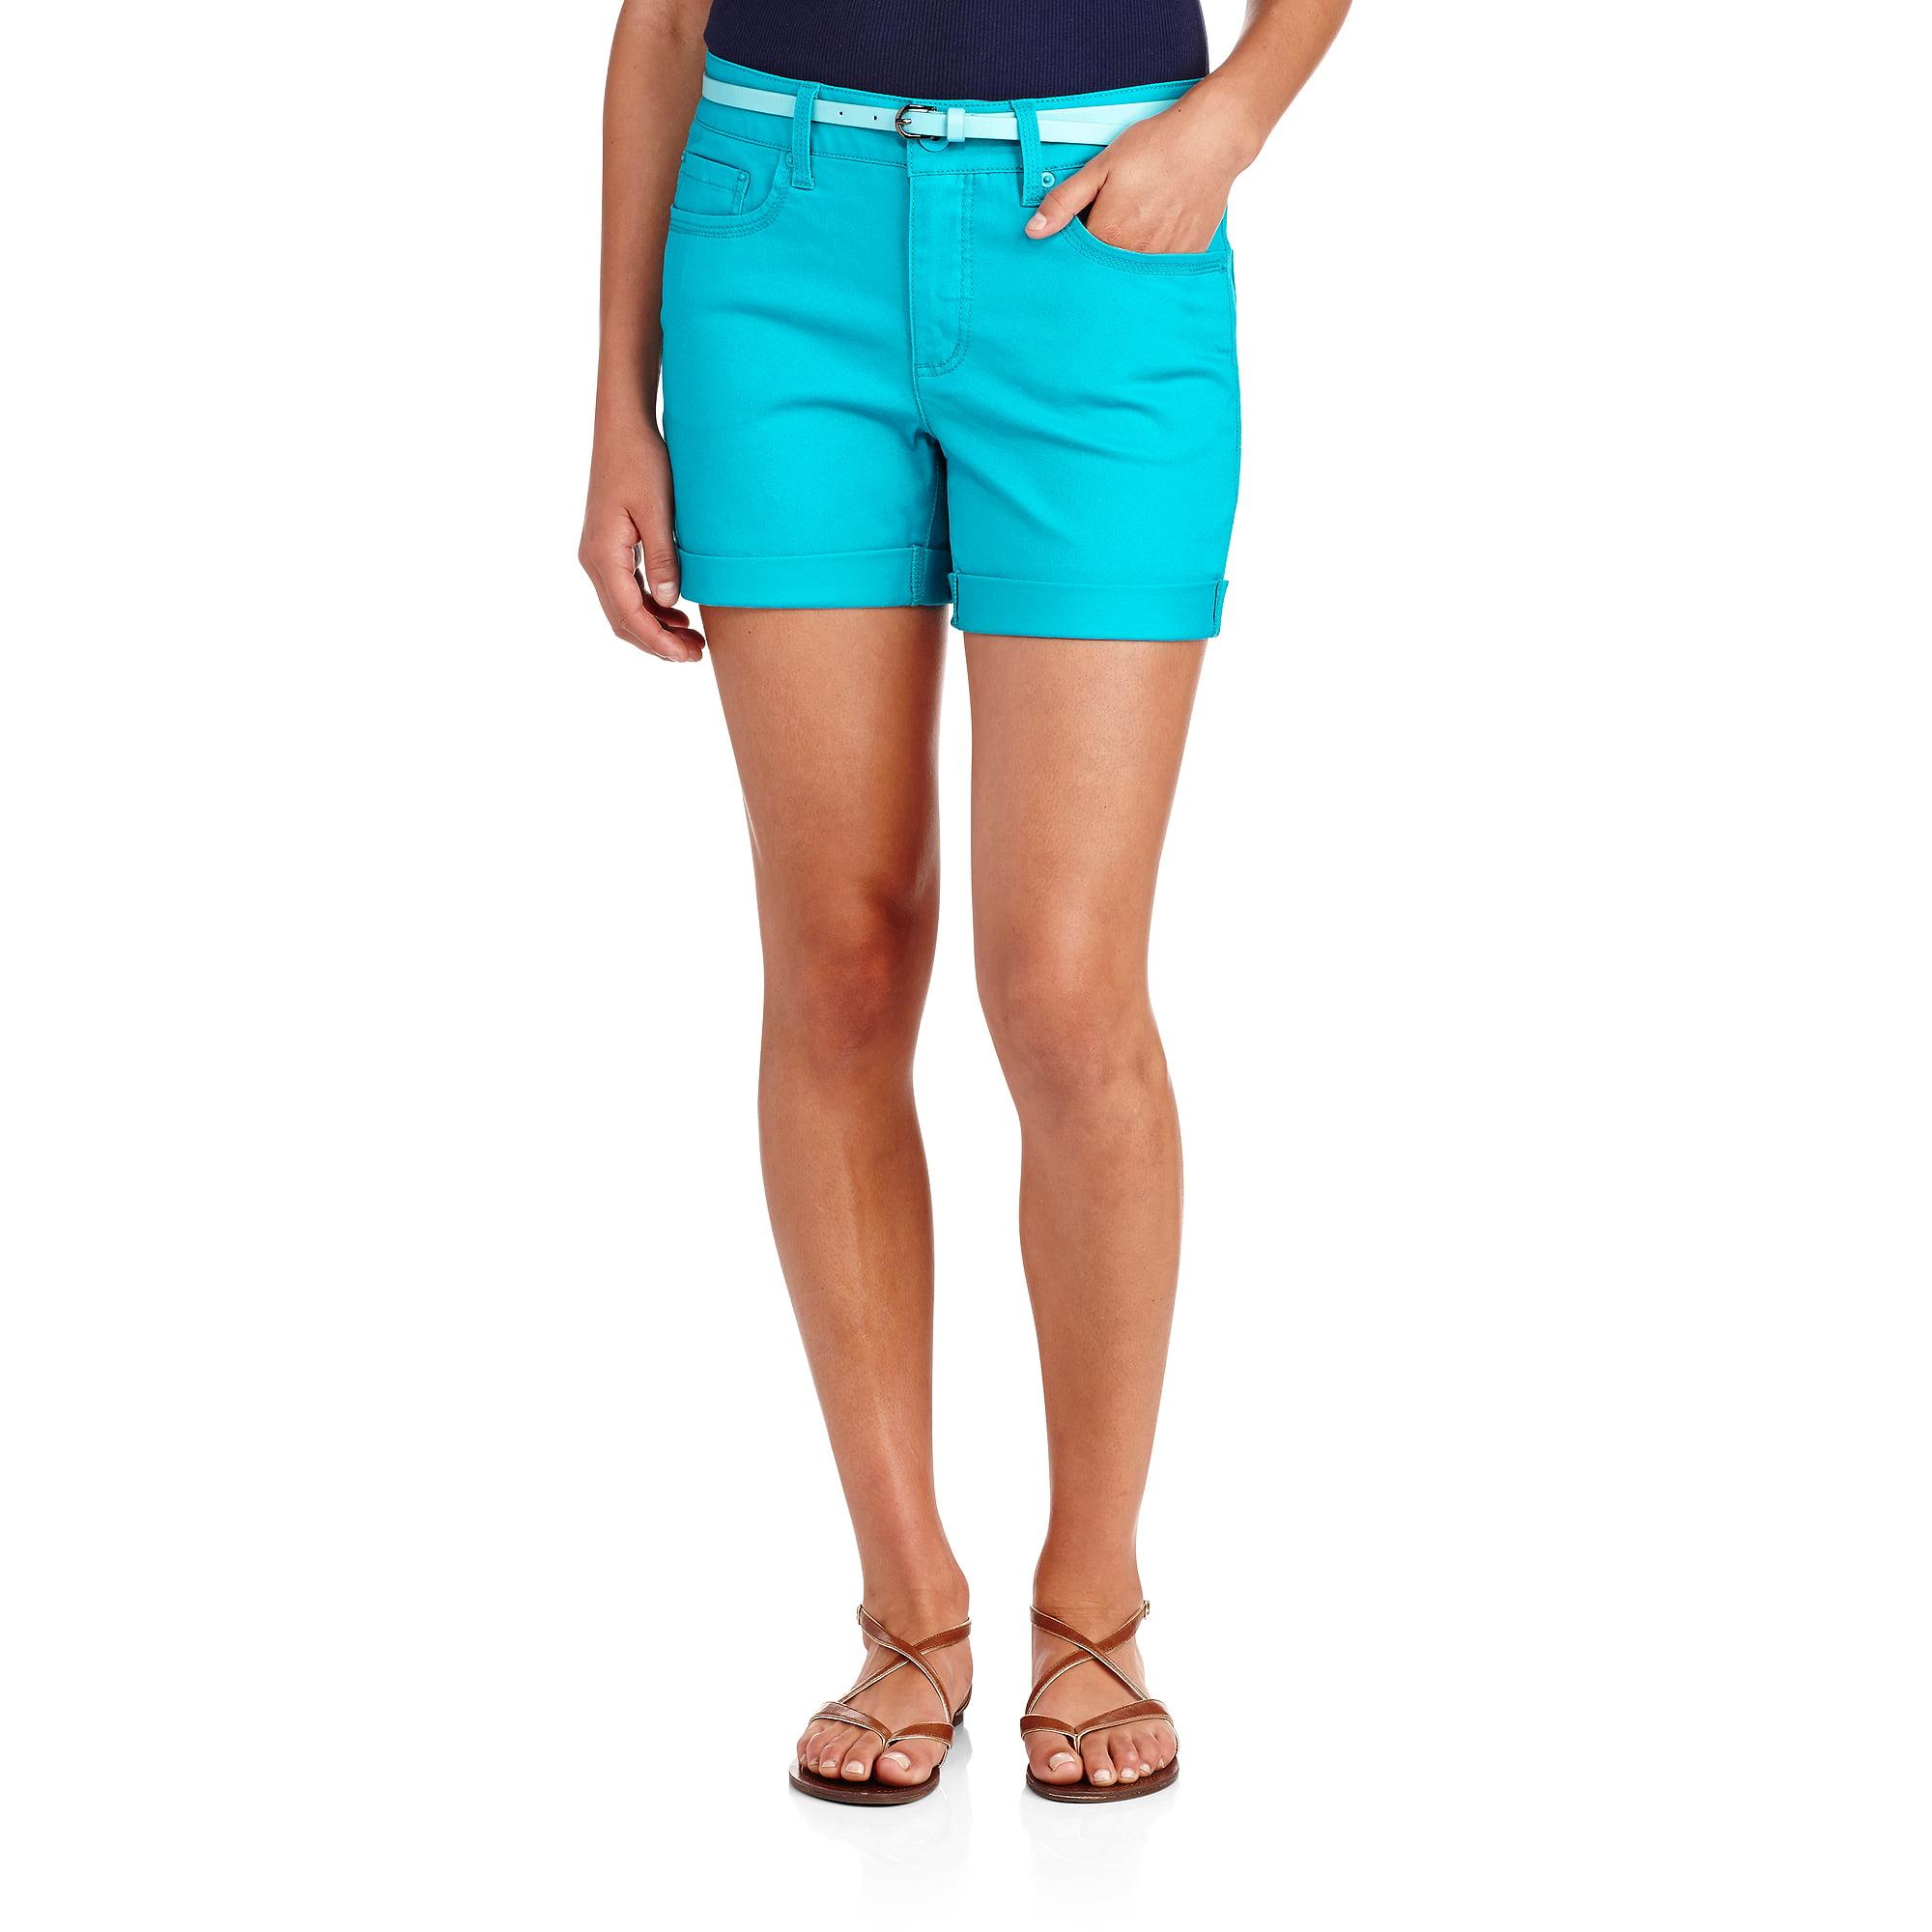 "Faded Glory Women's Classic Twill Belted 4.5"" Cuffed Shorts"